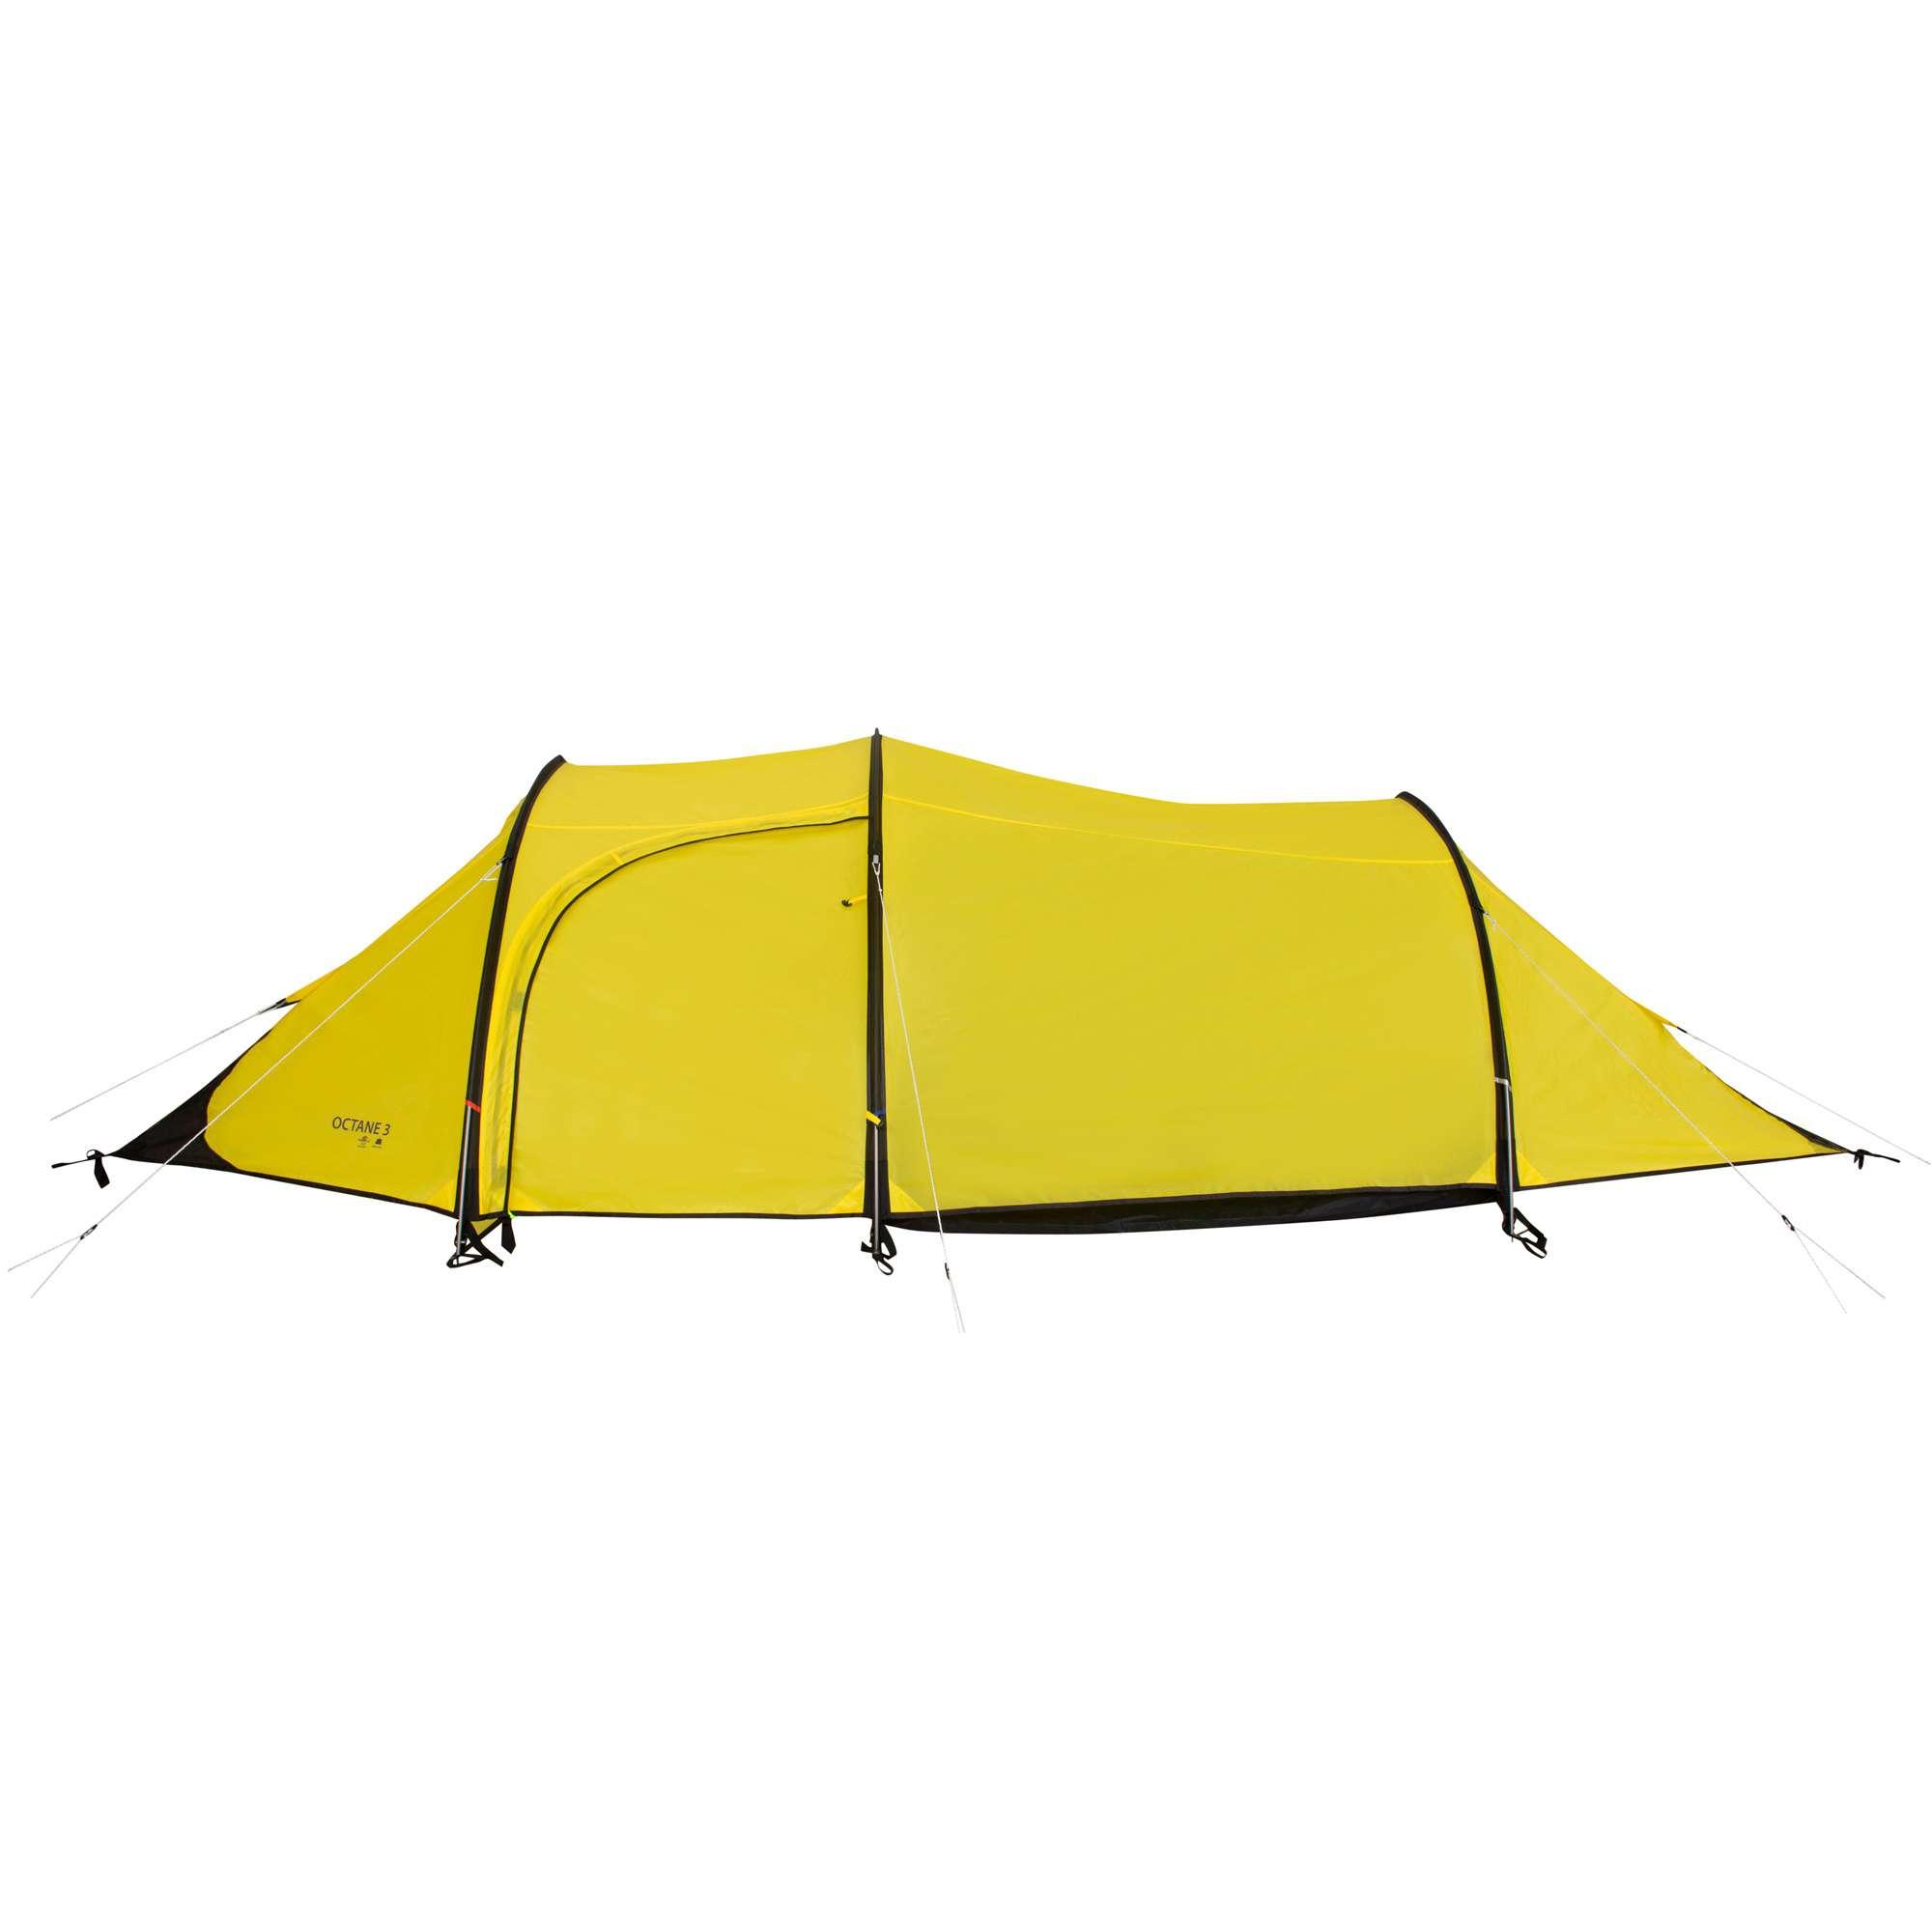 BLACKS Octane 3 Man Tent